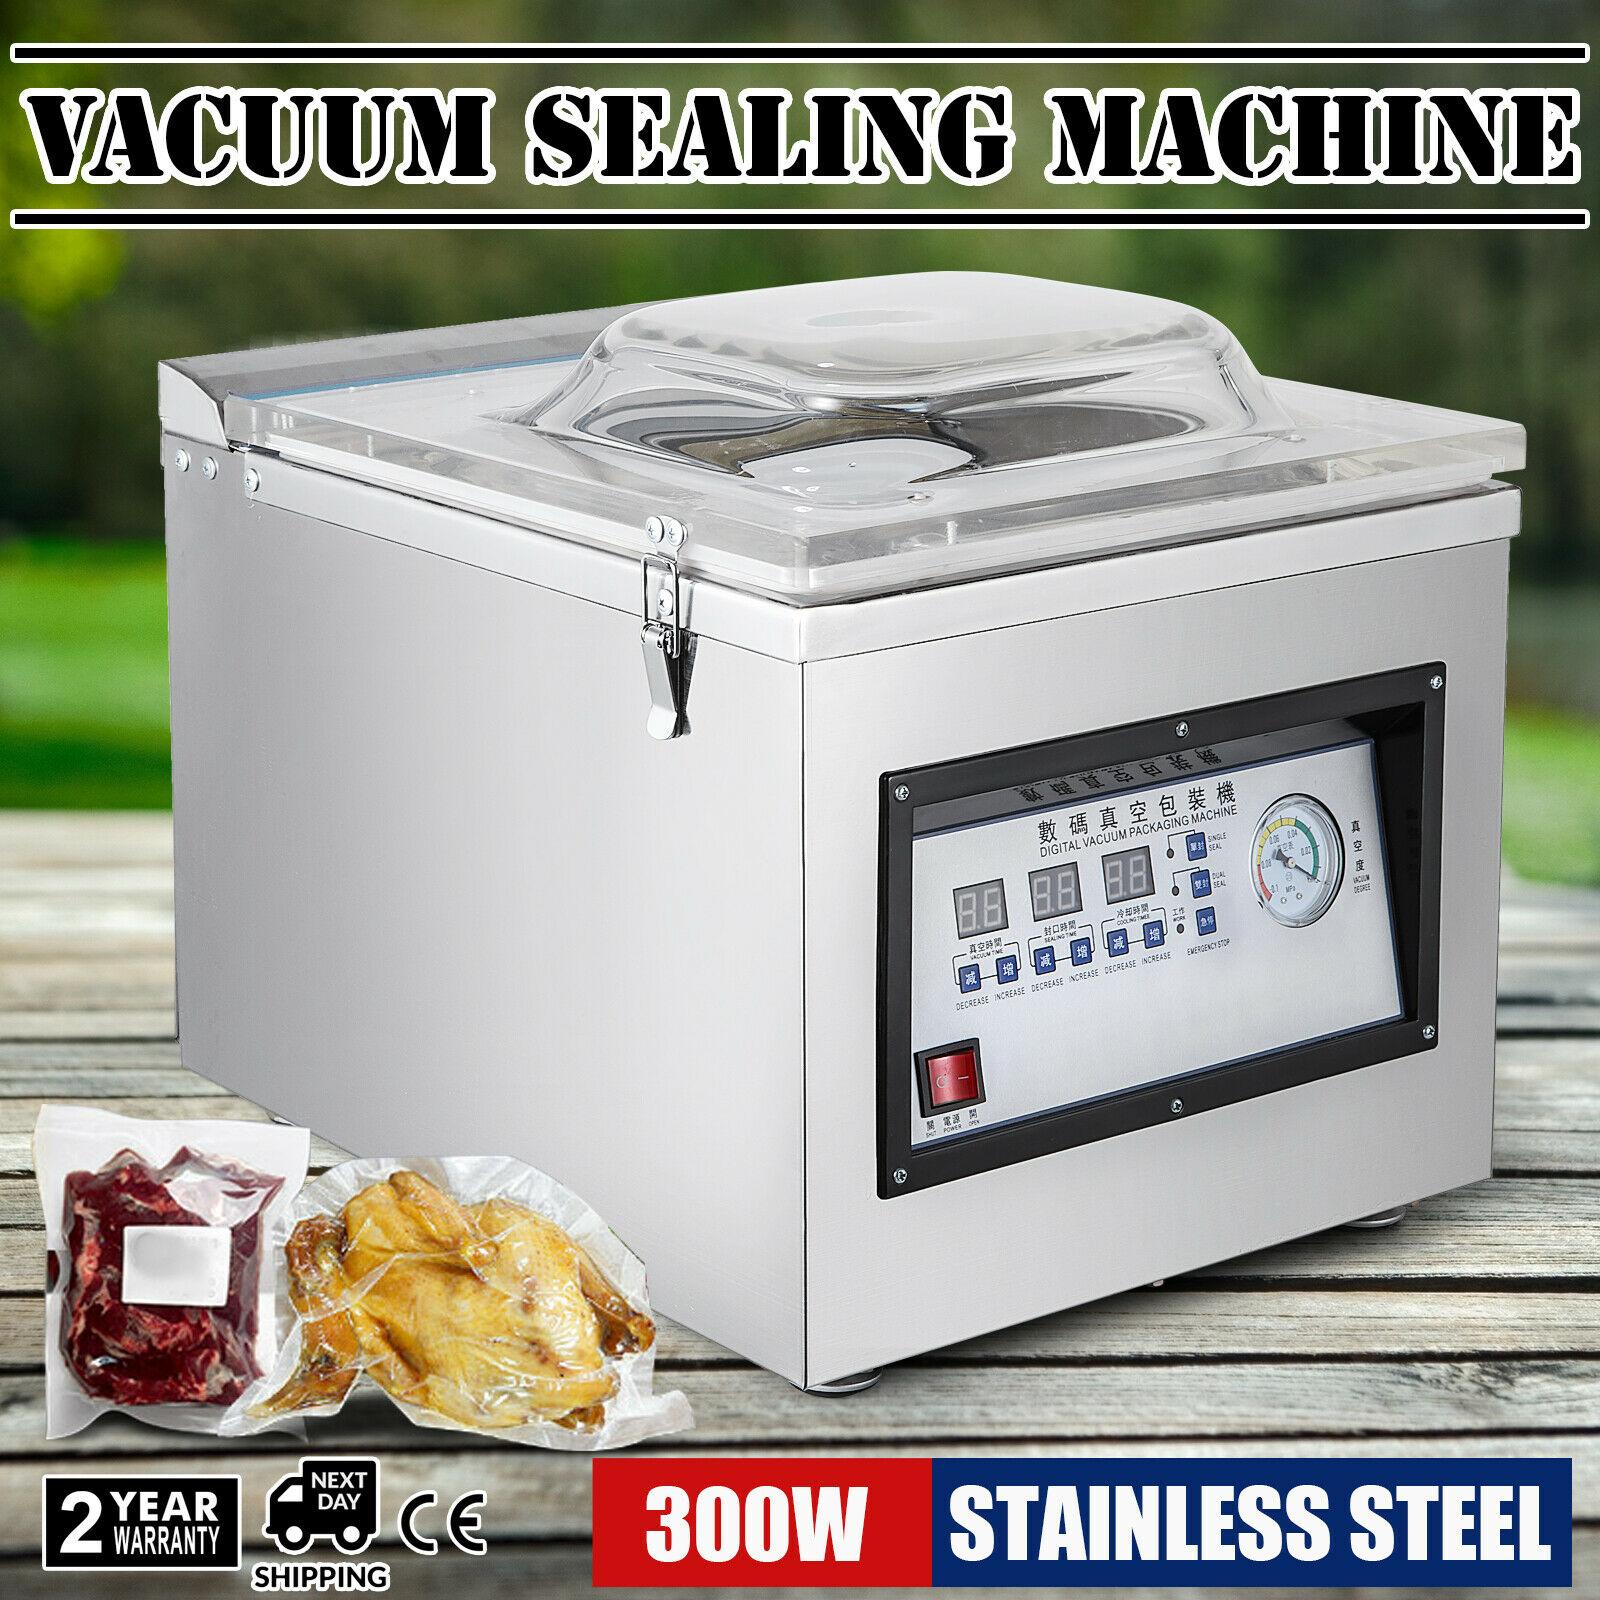 Z-260C Chamber Vacuum Sealer 300W Sealing Power Vacuum Sealer Automatic Sealer